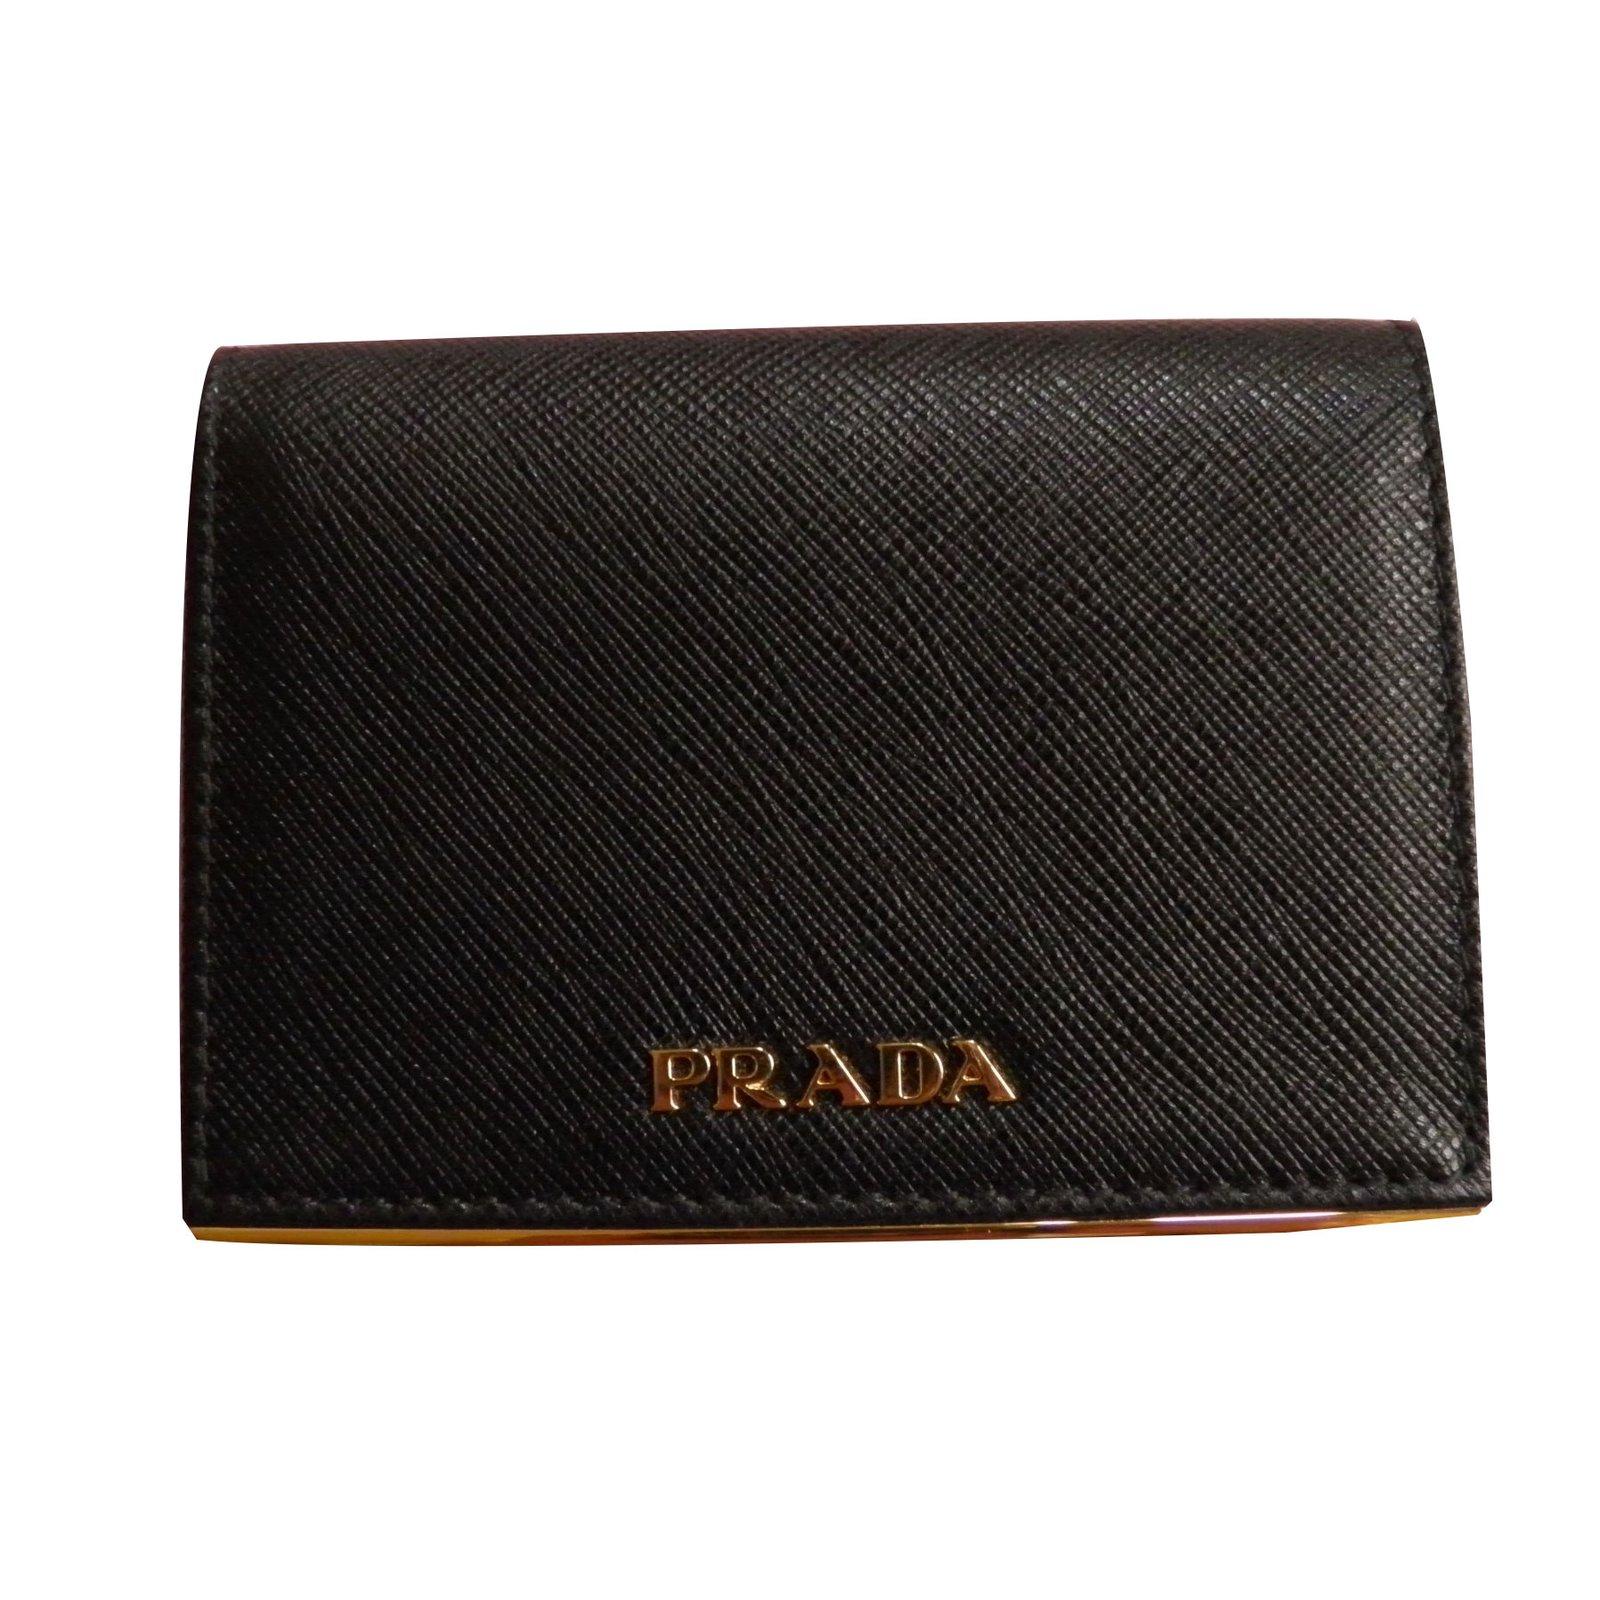 0bcc2256850016 usa prada card holder purses wallets cases leather black ref.57091 19bc9  26c3f